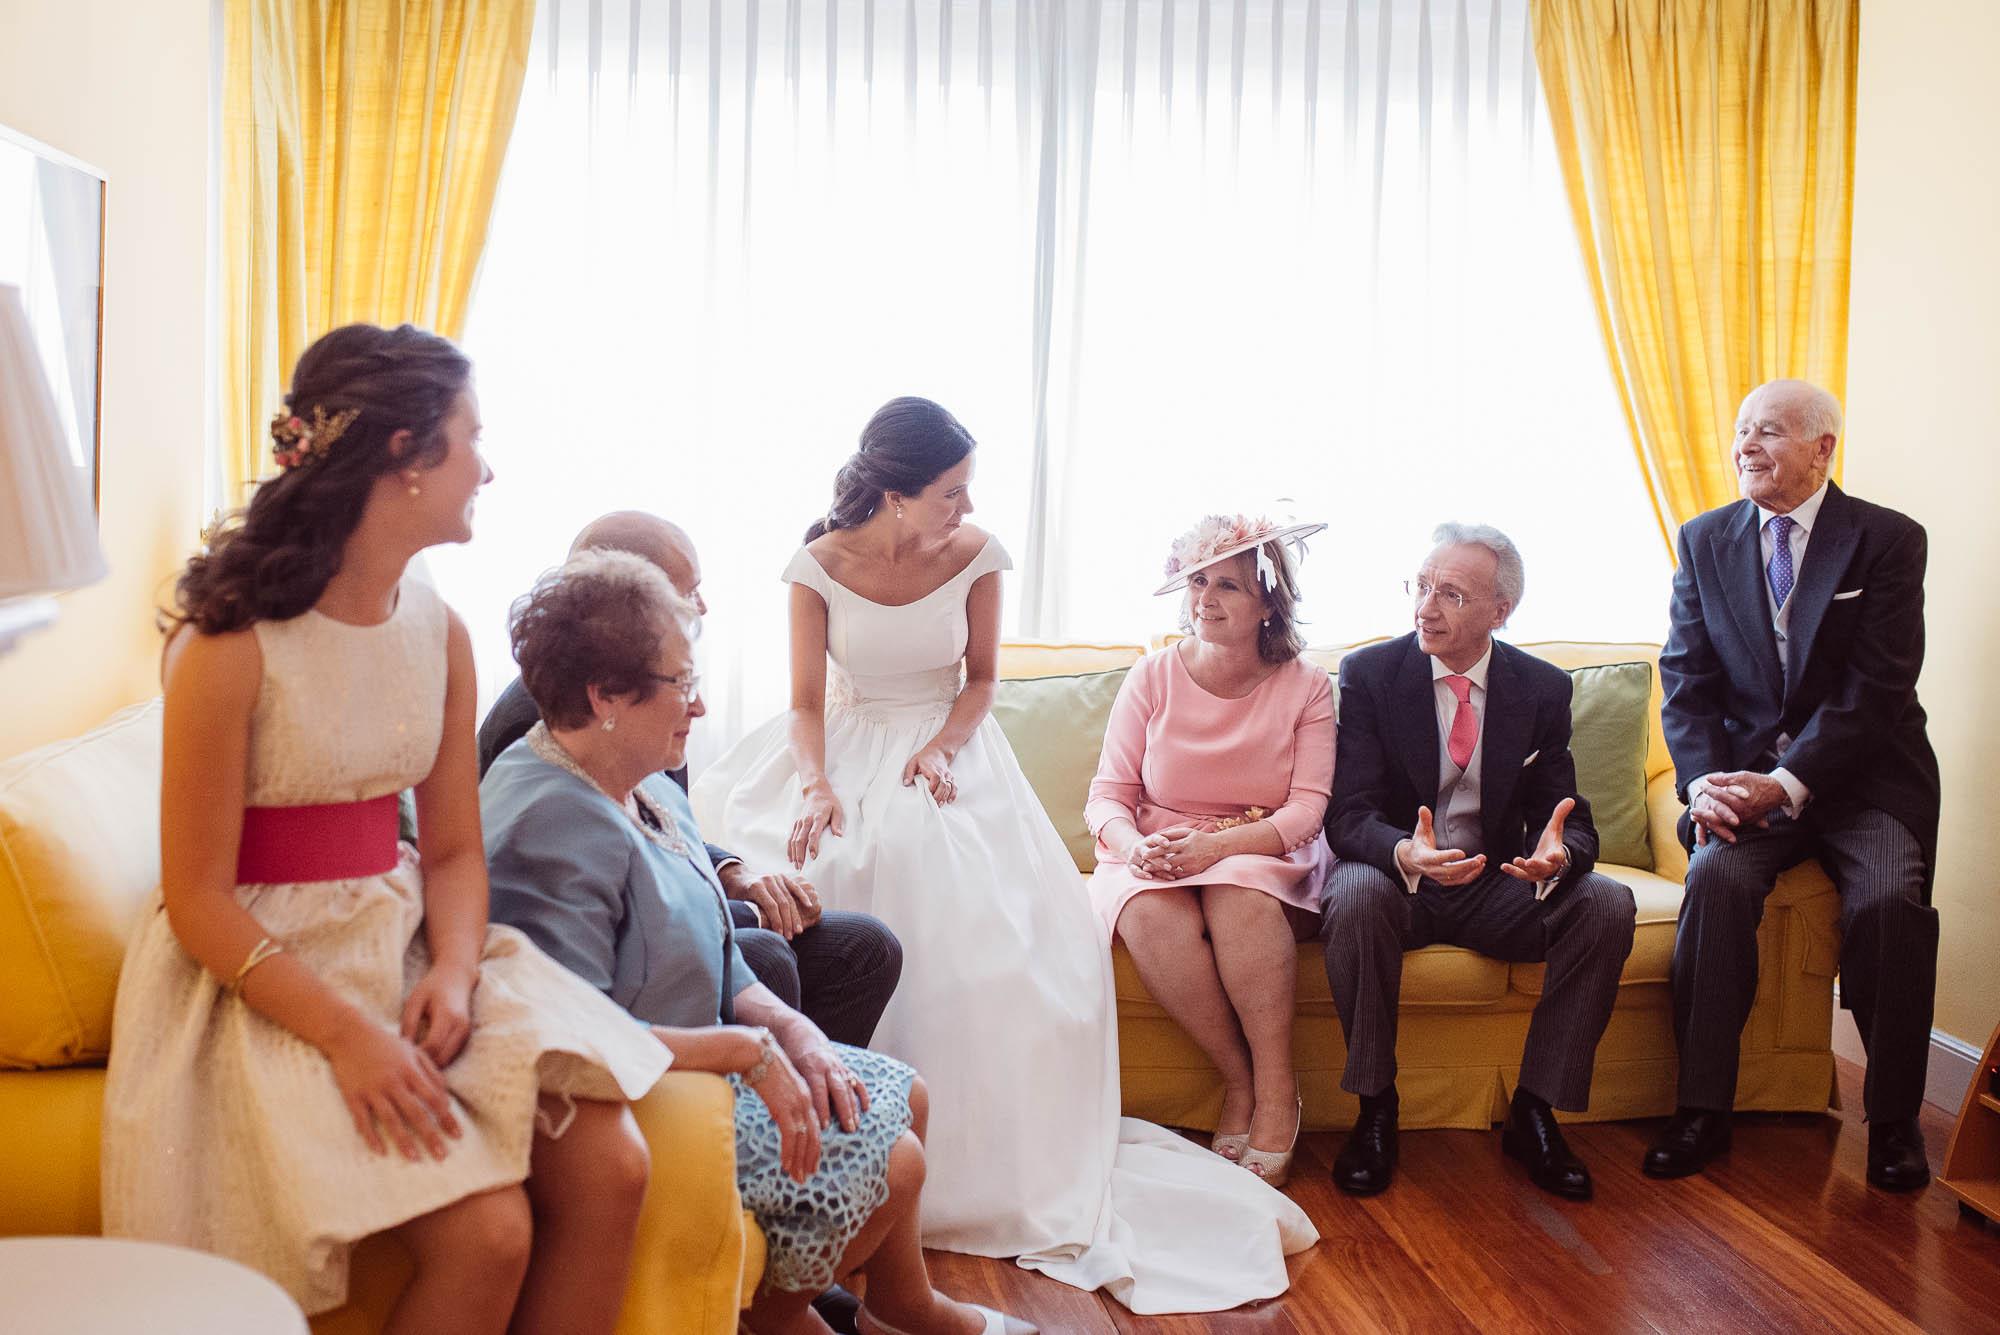 La familia se reúne con la novia en el salón de la casa